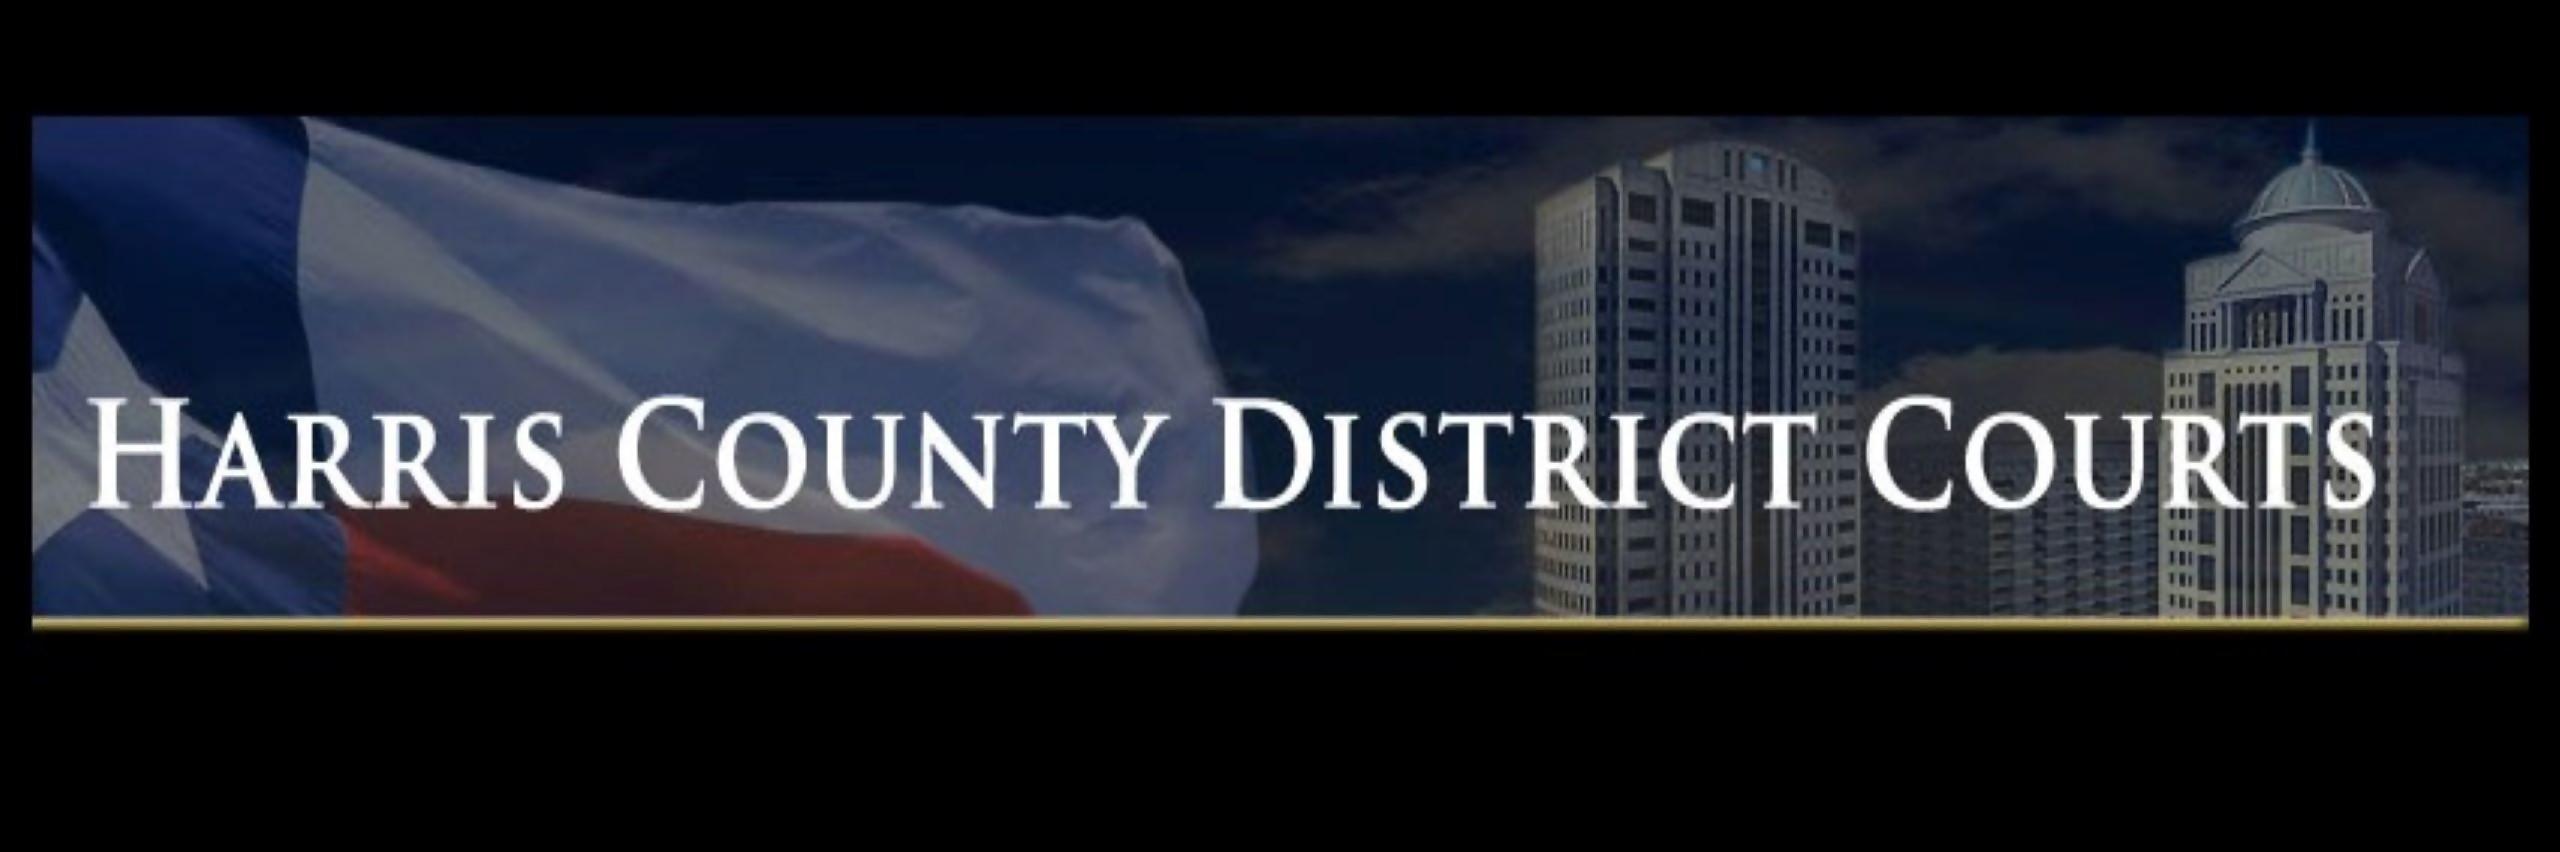 11th Administrative Judicial Region of Texas